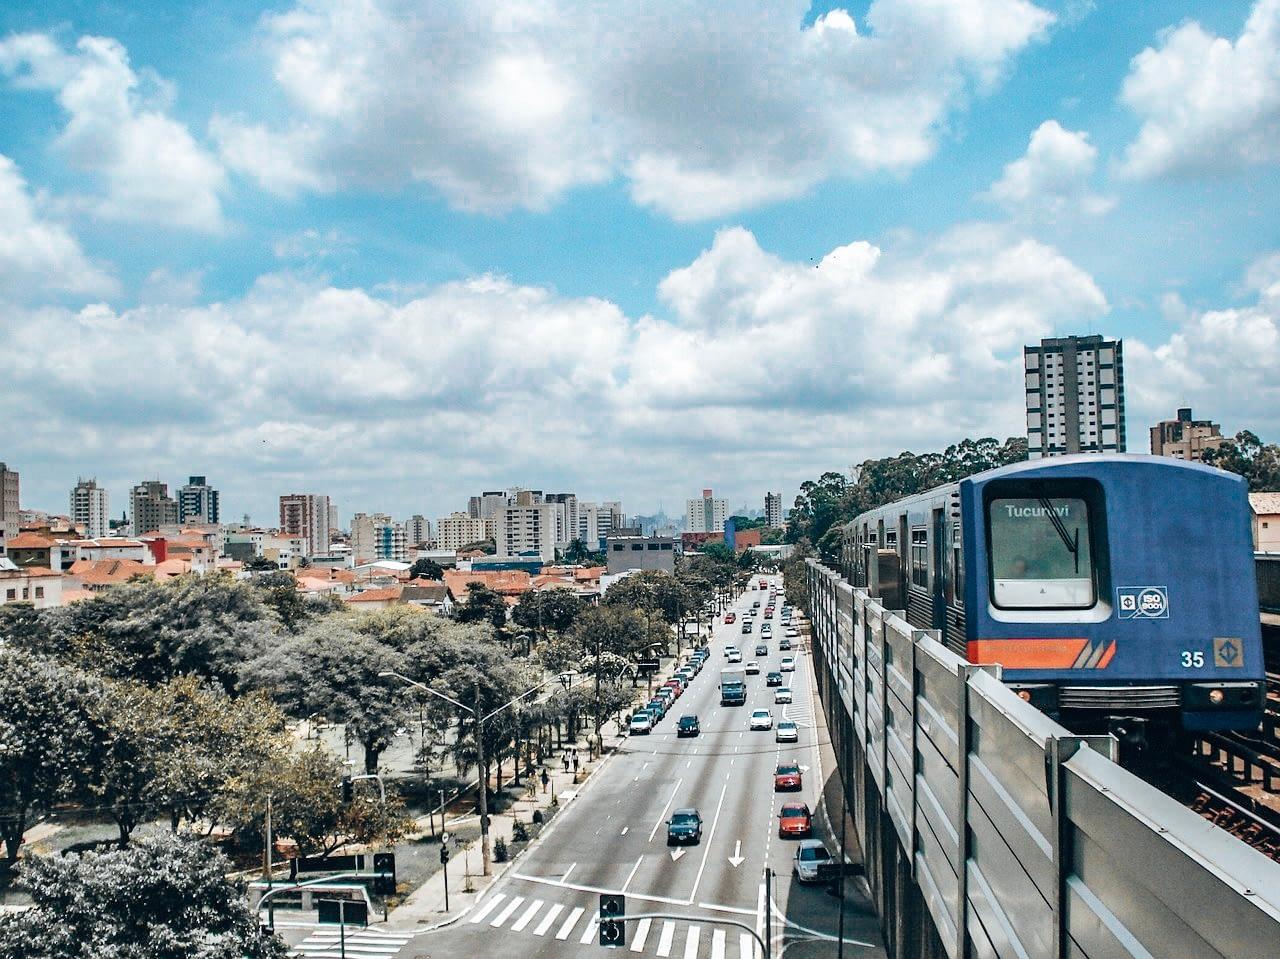 Rio Carnival Subway